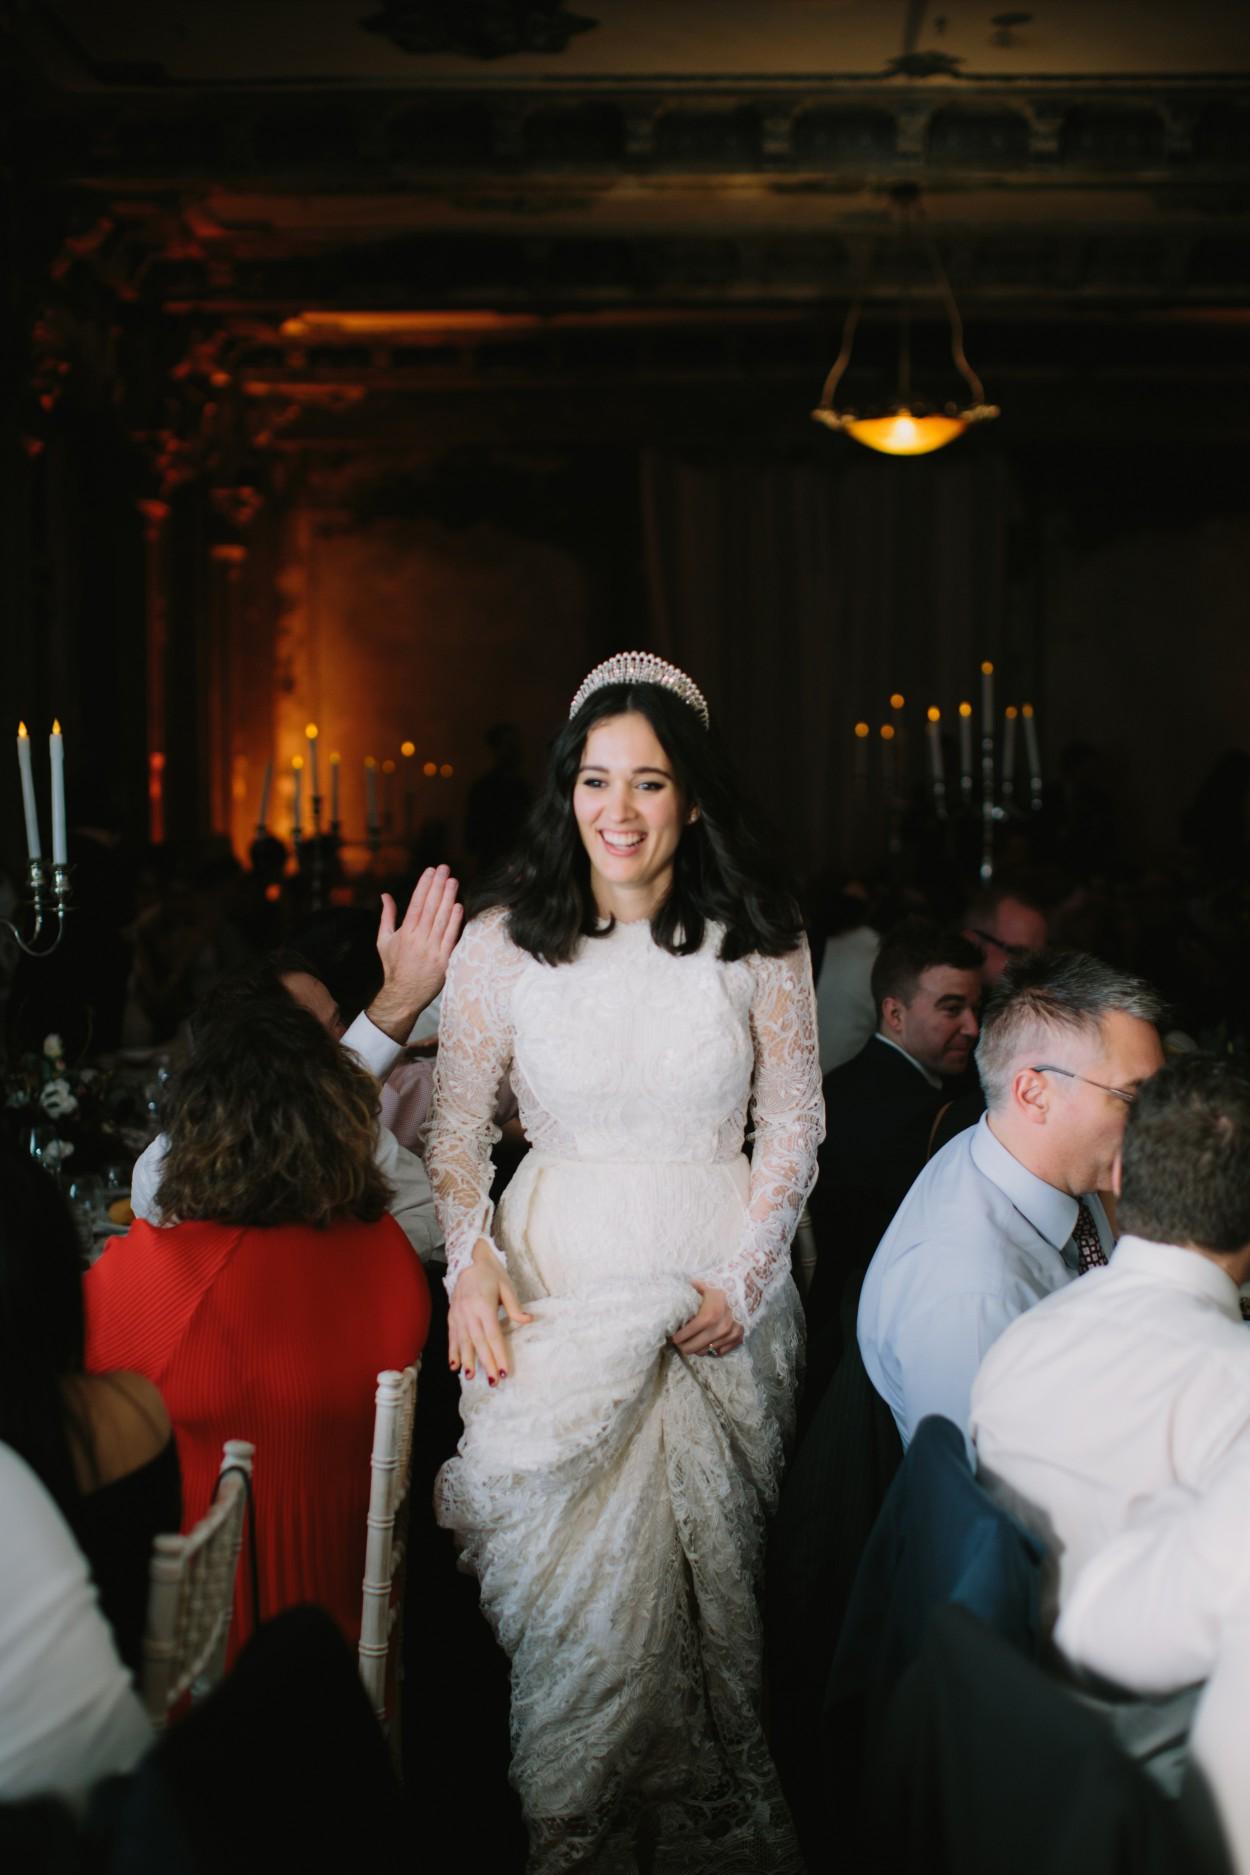 I-Got-You-Babe-Weddings-The-128George-Ballroom-St-Kilda-Wedding-Amy-Abhi.jpg